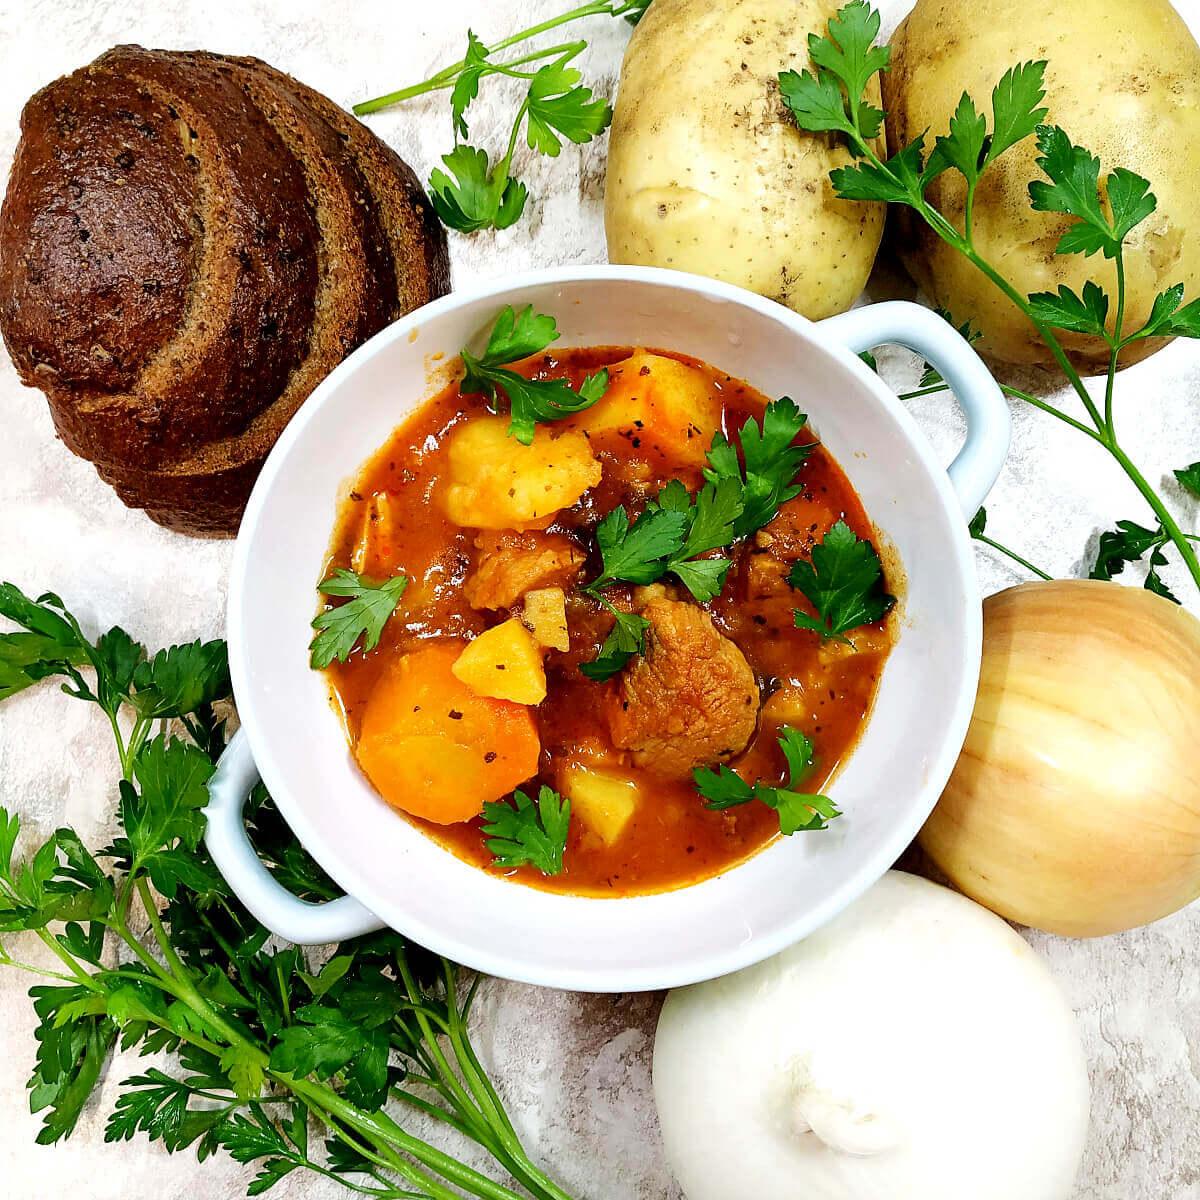 Romain Pork Stew